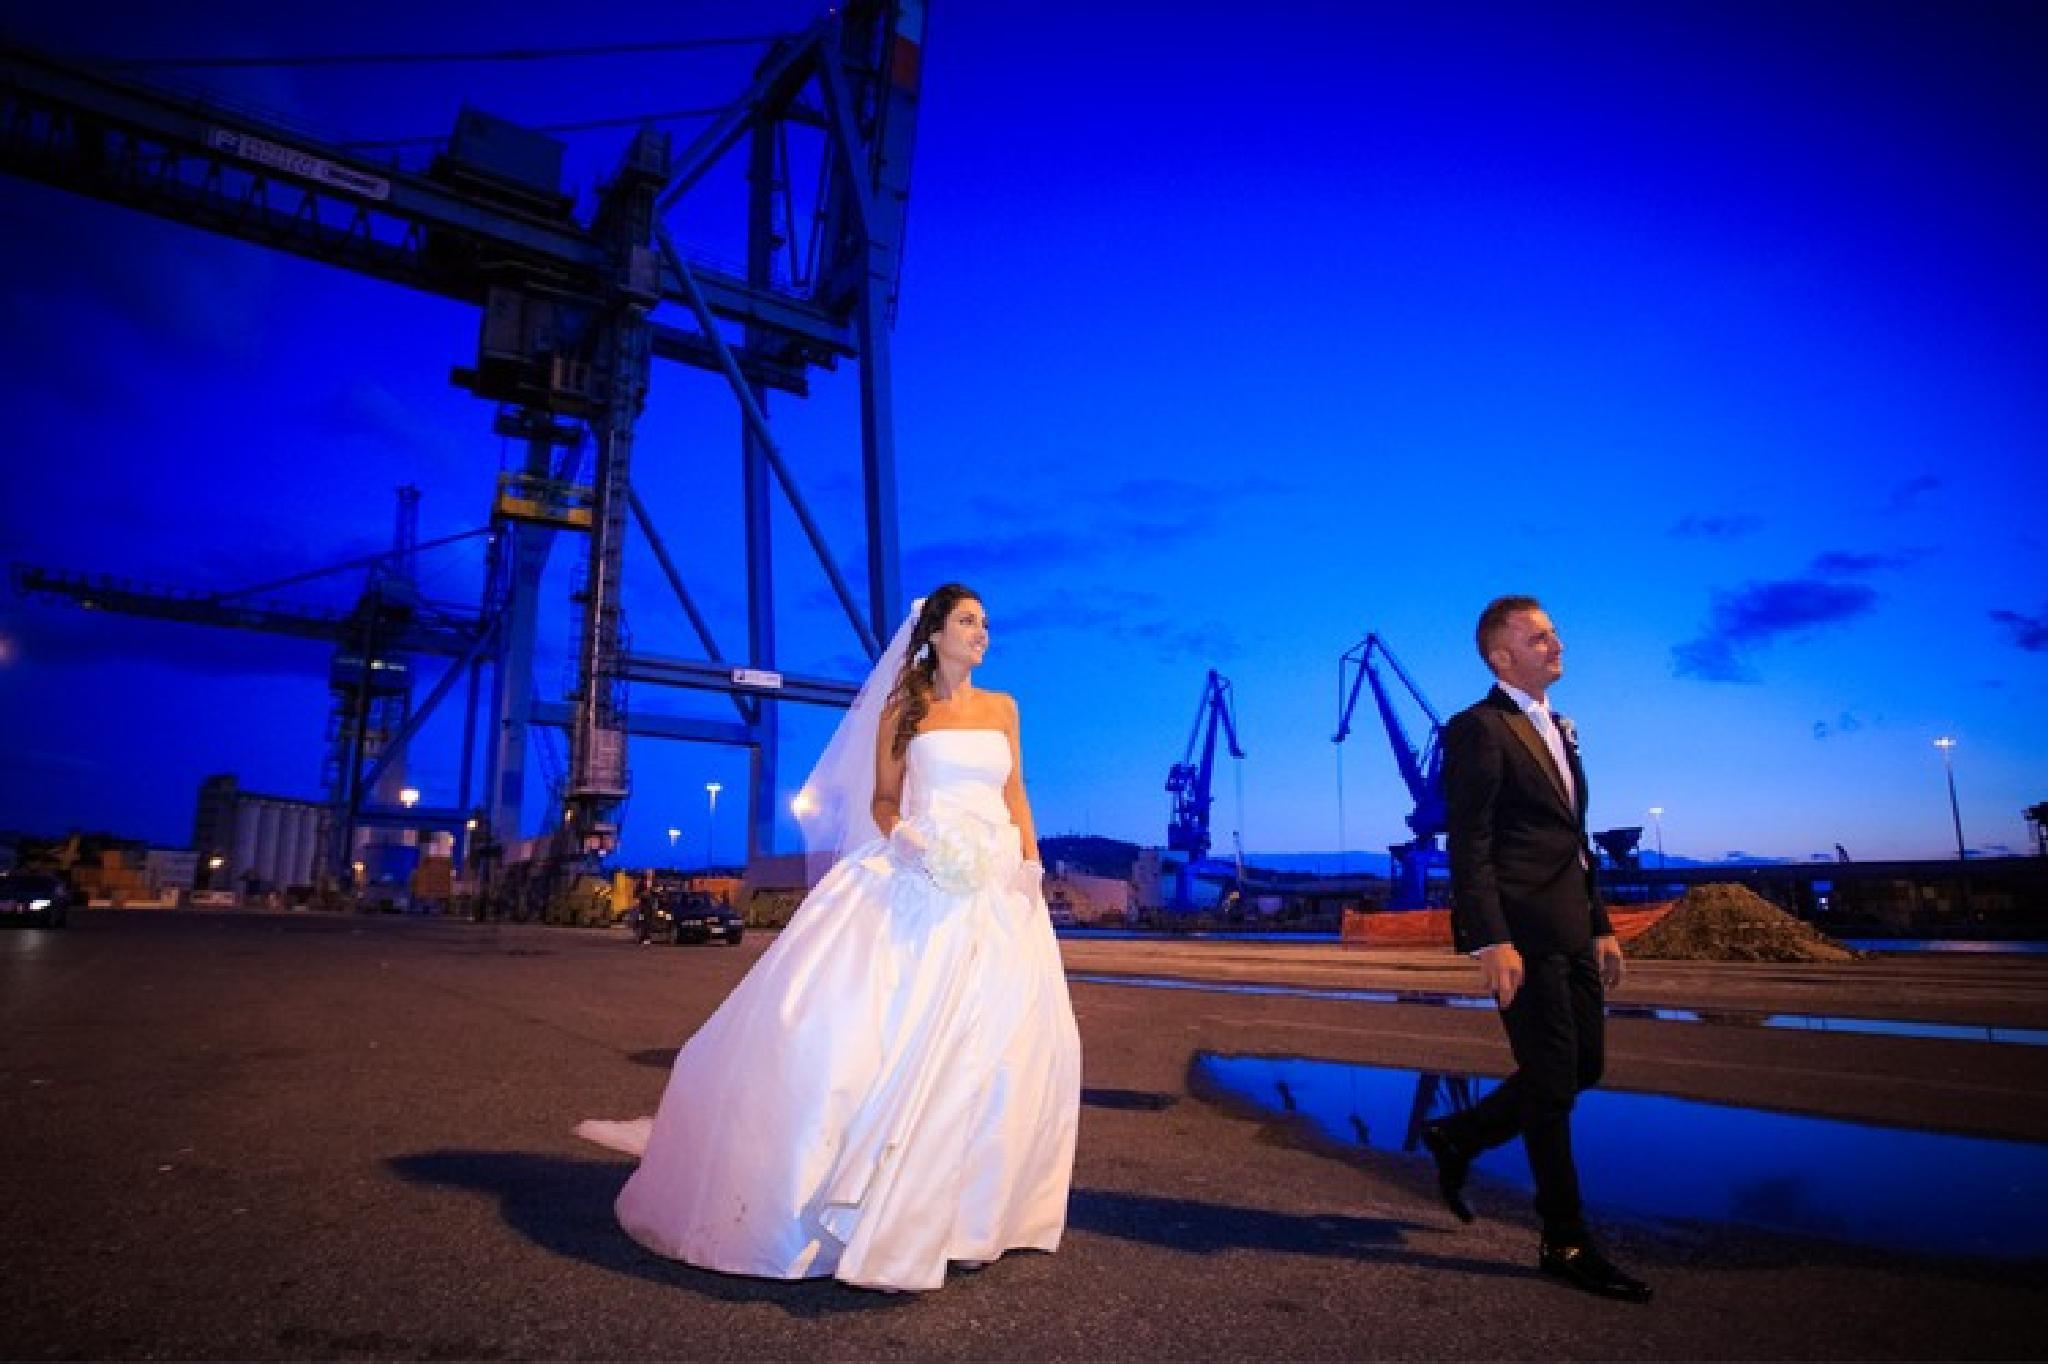 wedding moments by adriatikberdaku